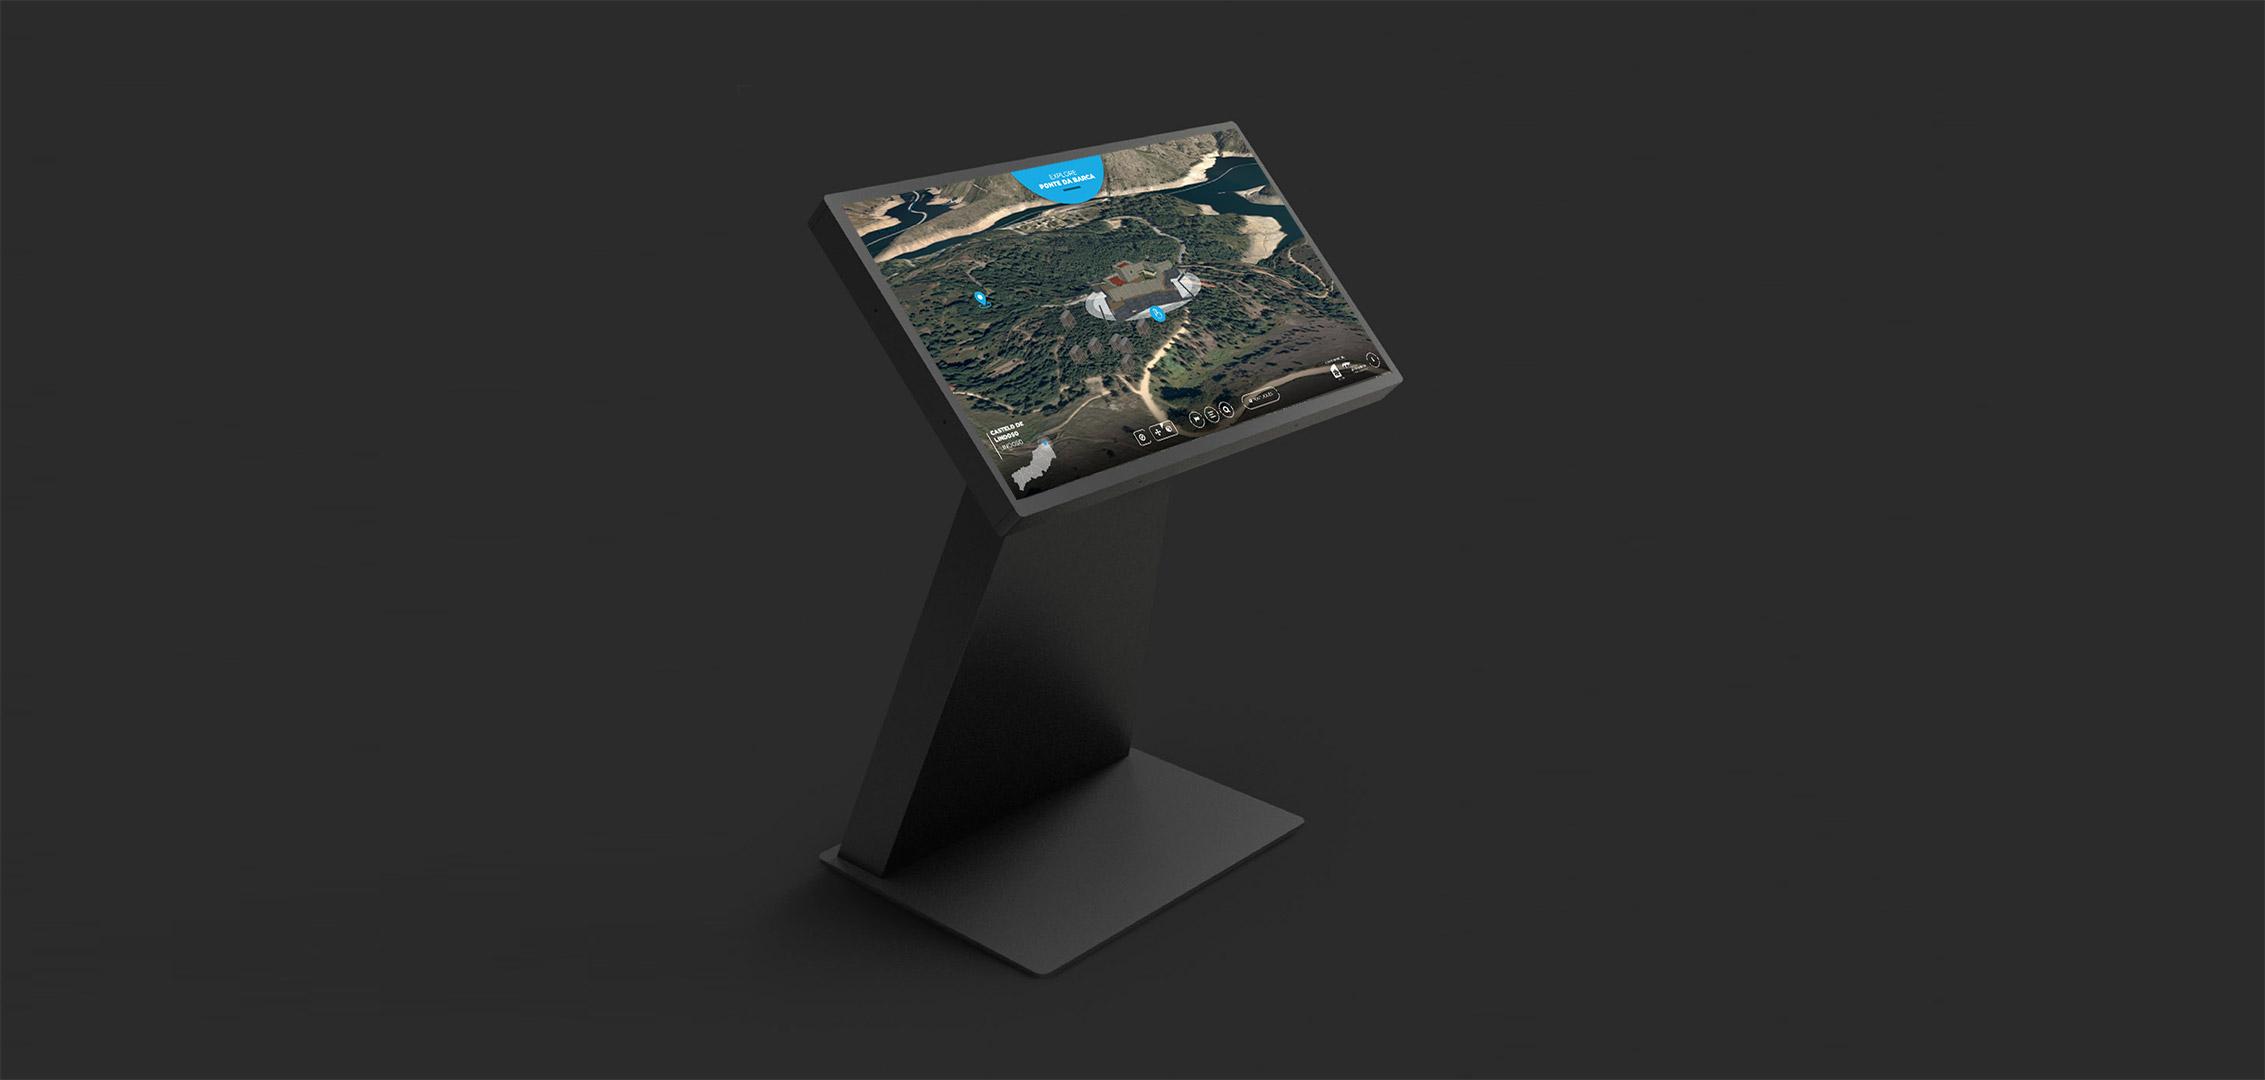 mesa interativa de Ponte da Barca desenvolvida por iIfoportugal